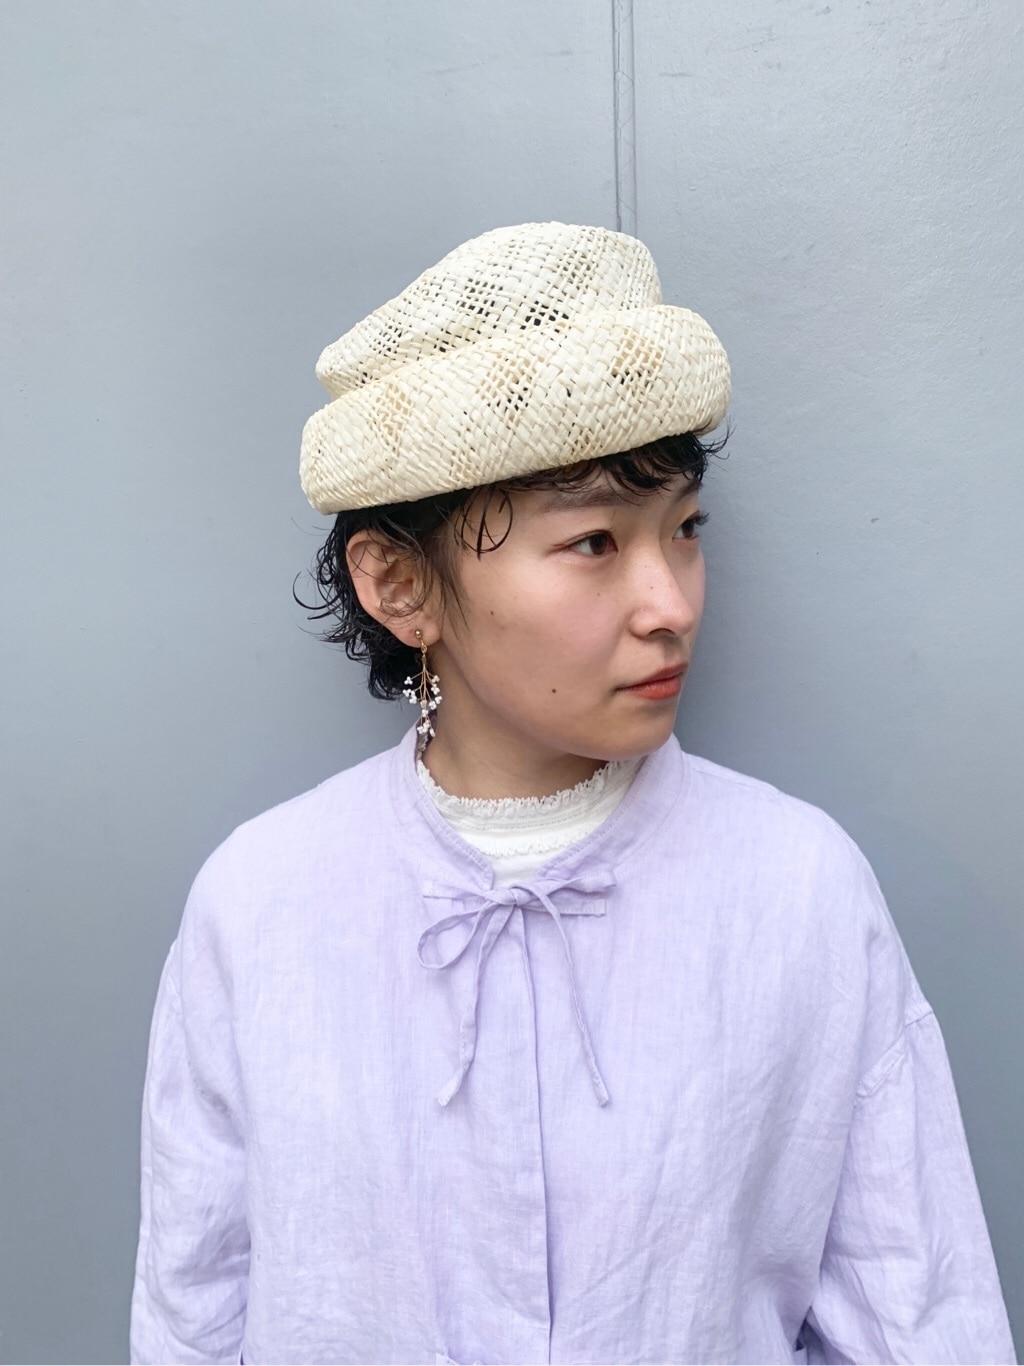 bulle de savon 新宿ミロード 身長:159cm 2020.04.06